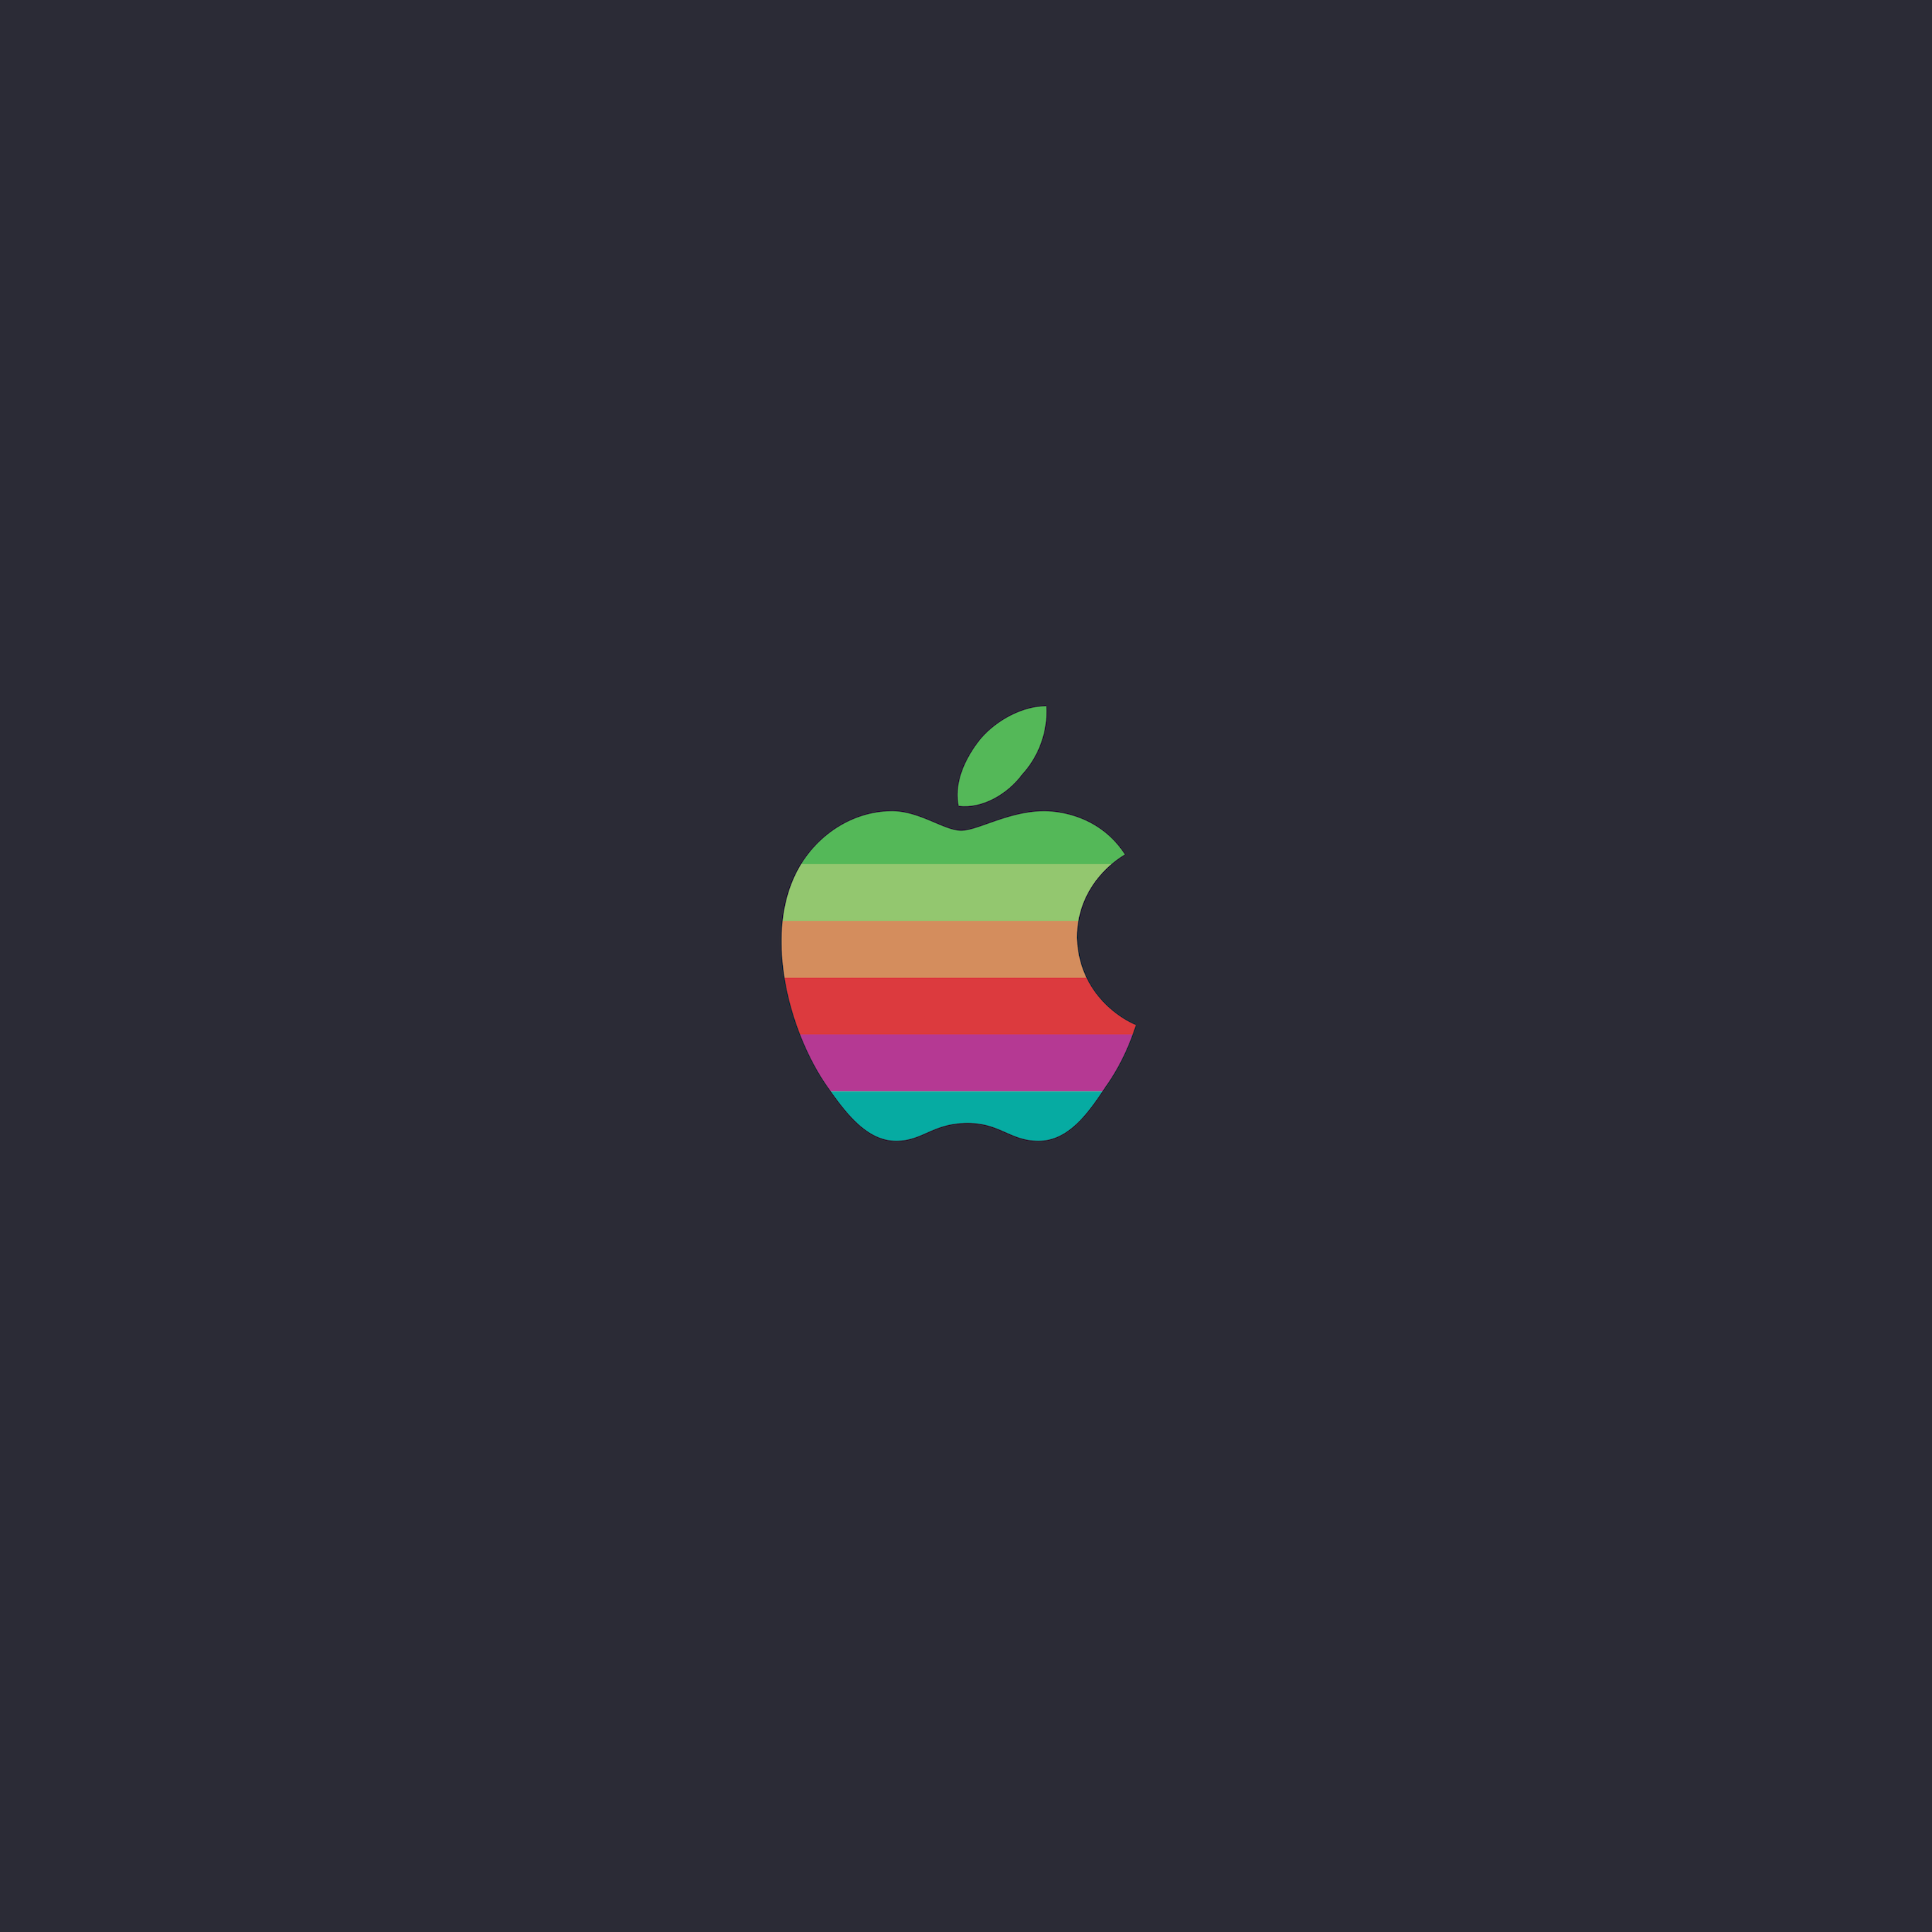 Retro apple logo wwdc 2016 wallpapers - Original apple logo wallpaper ...